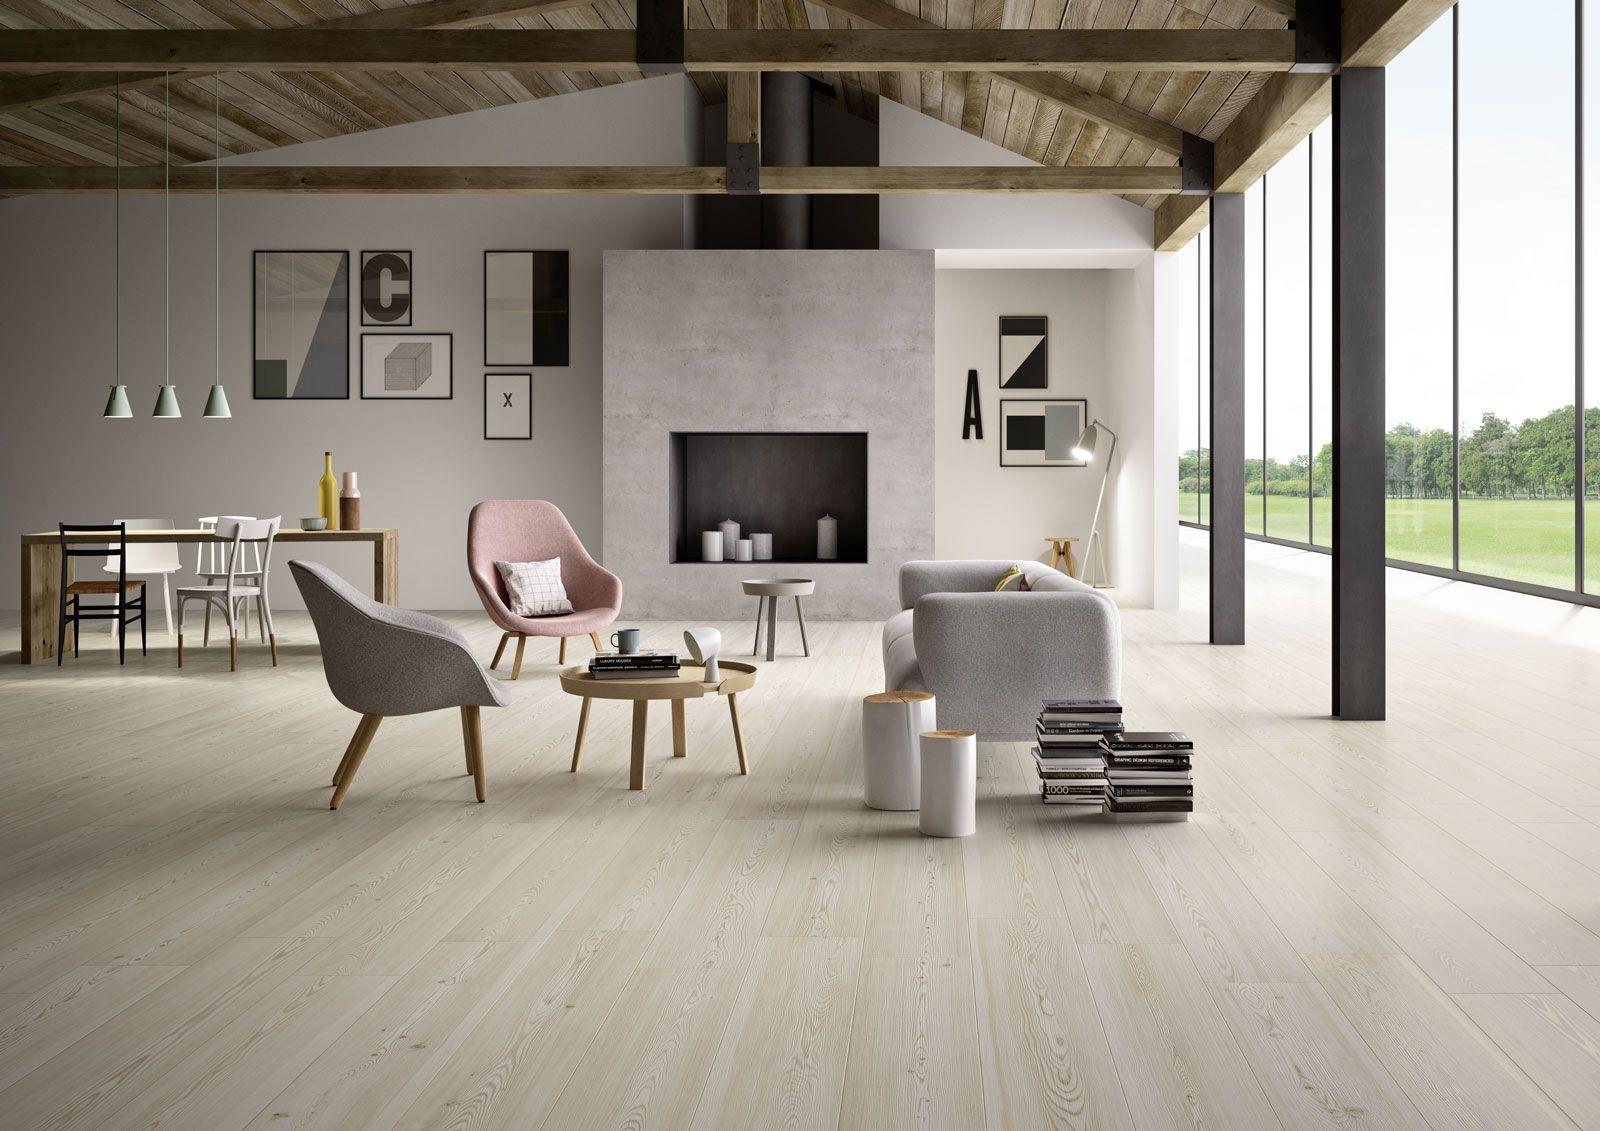 Treverktrend - Wood effect stoneware | Marazzi | Living room ...